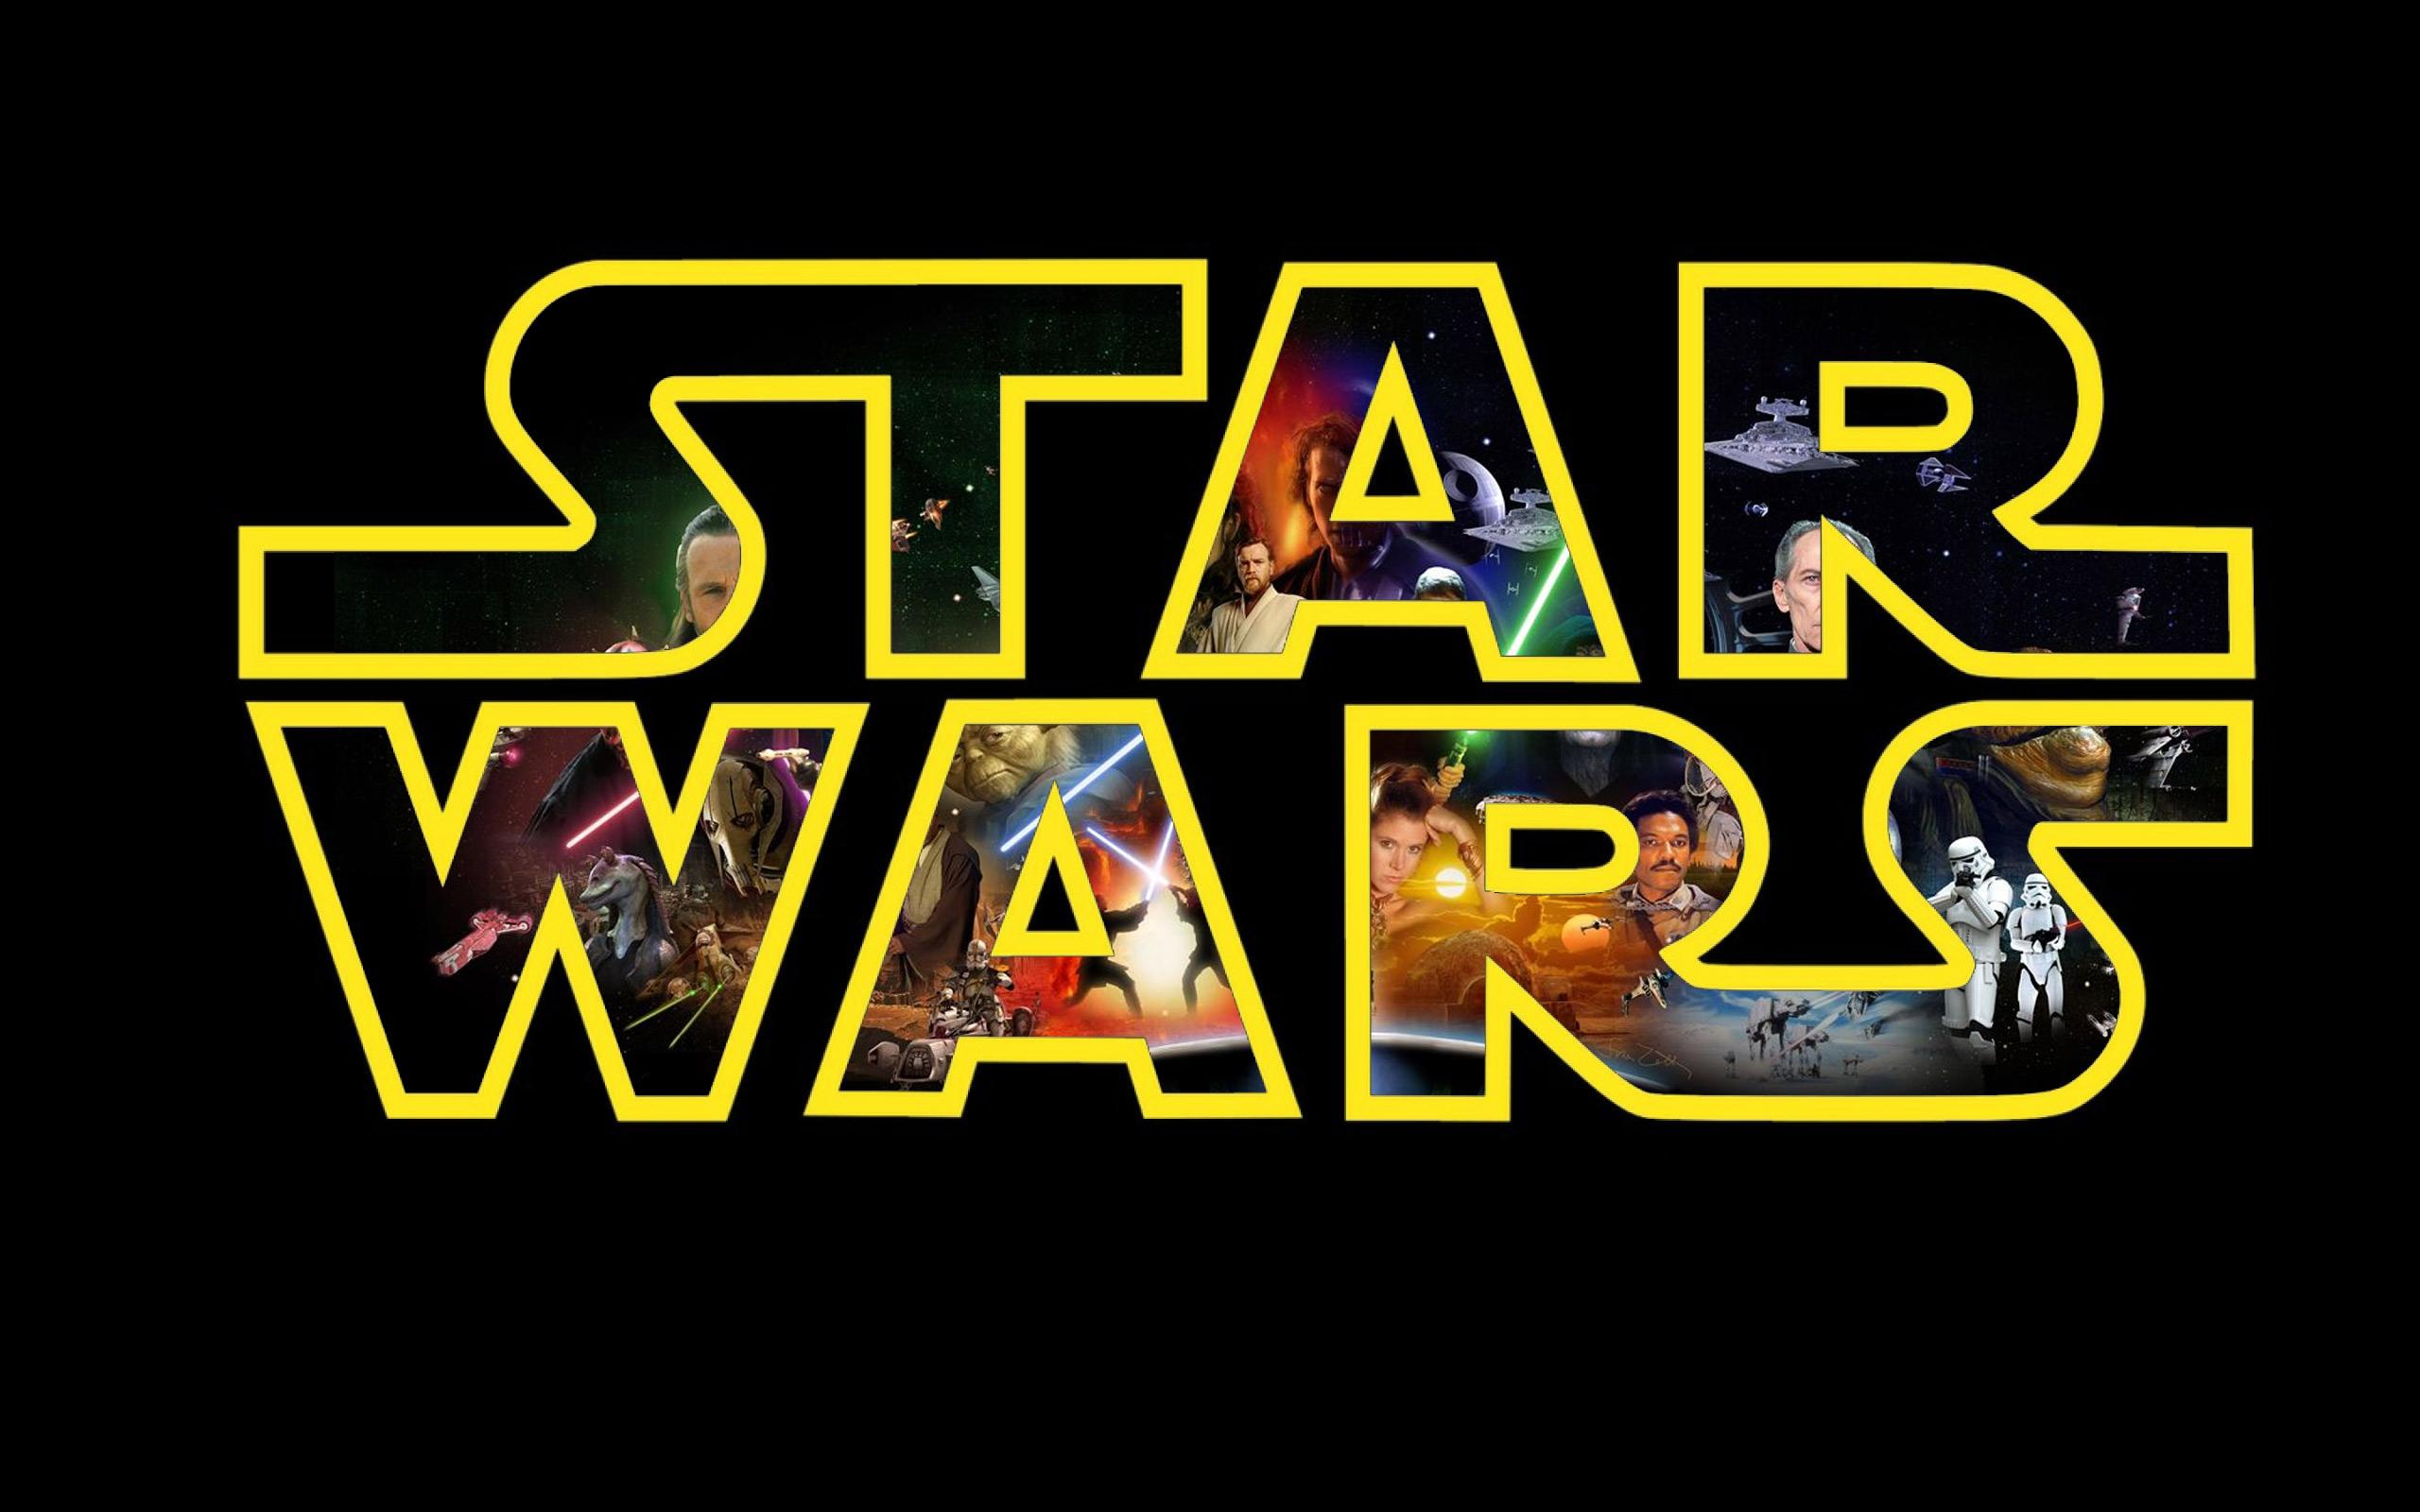 Free Star Wars Screensavers And Wallpaper